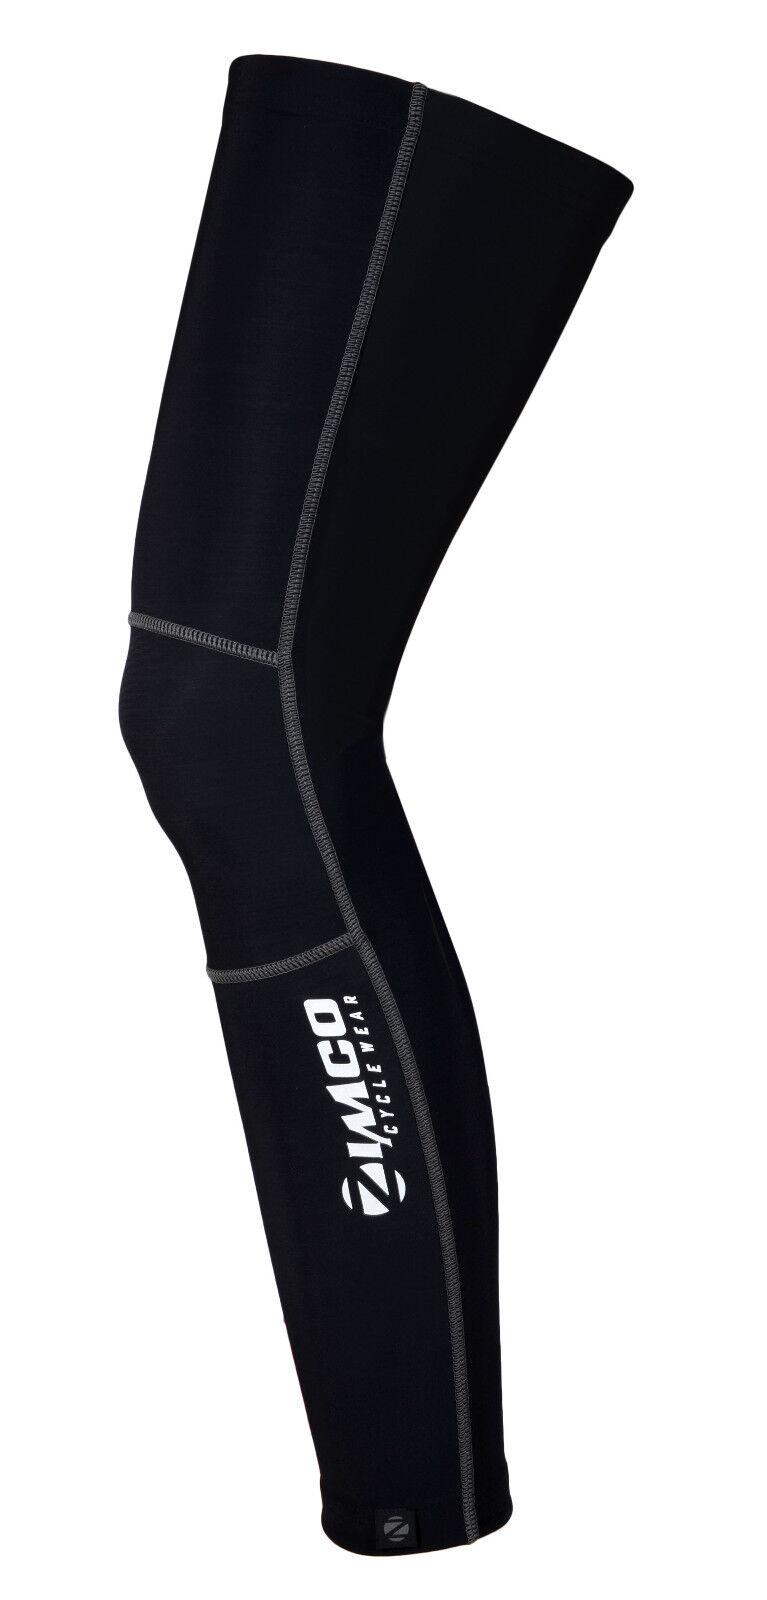 Zimco Cycling Super Roubaix Leg Warmers Thermal Fleece Bicycle Leg Sleeve White